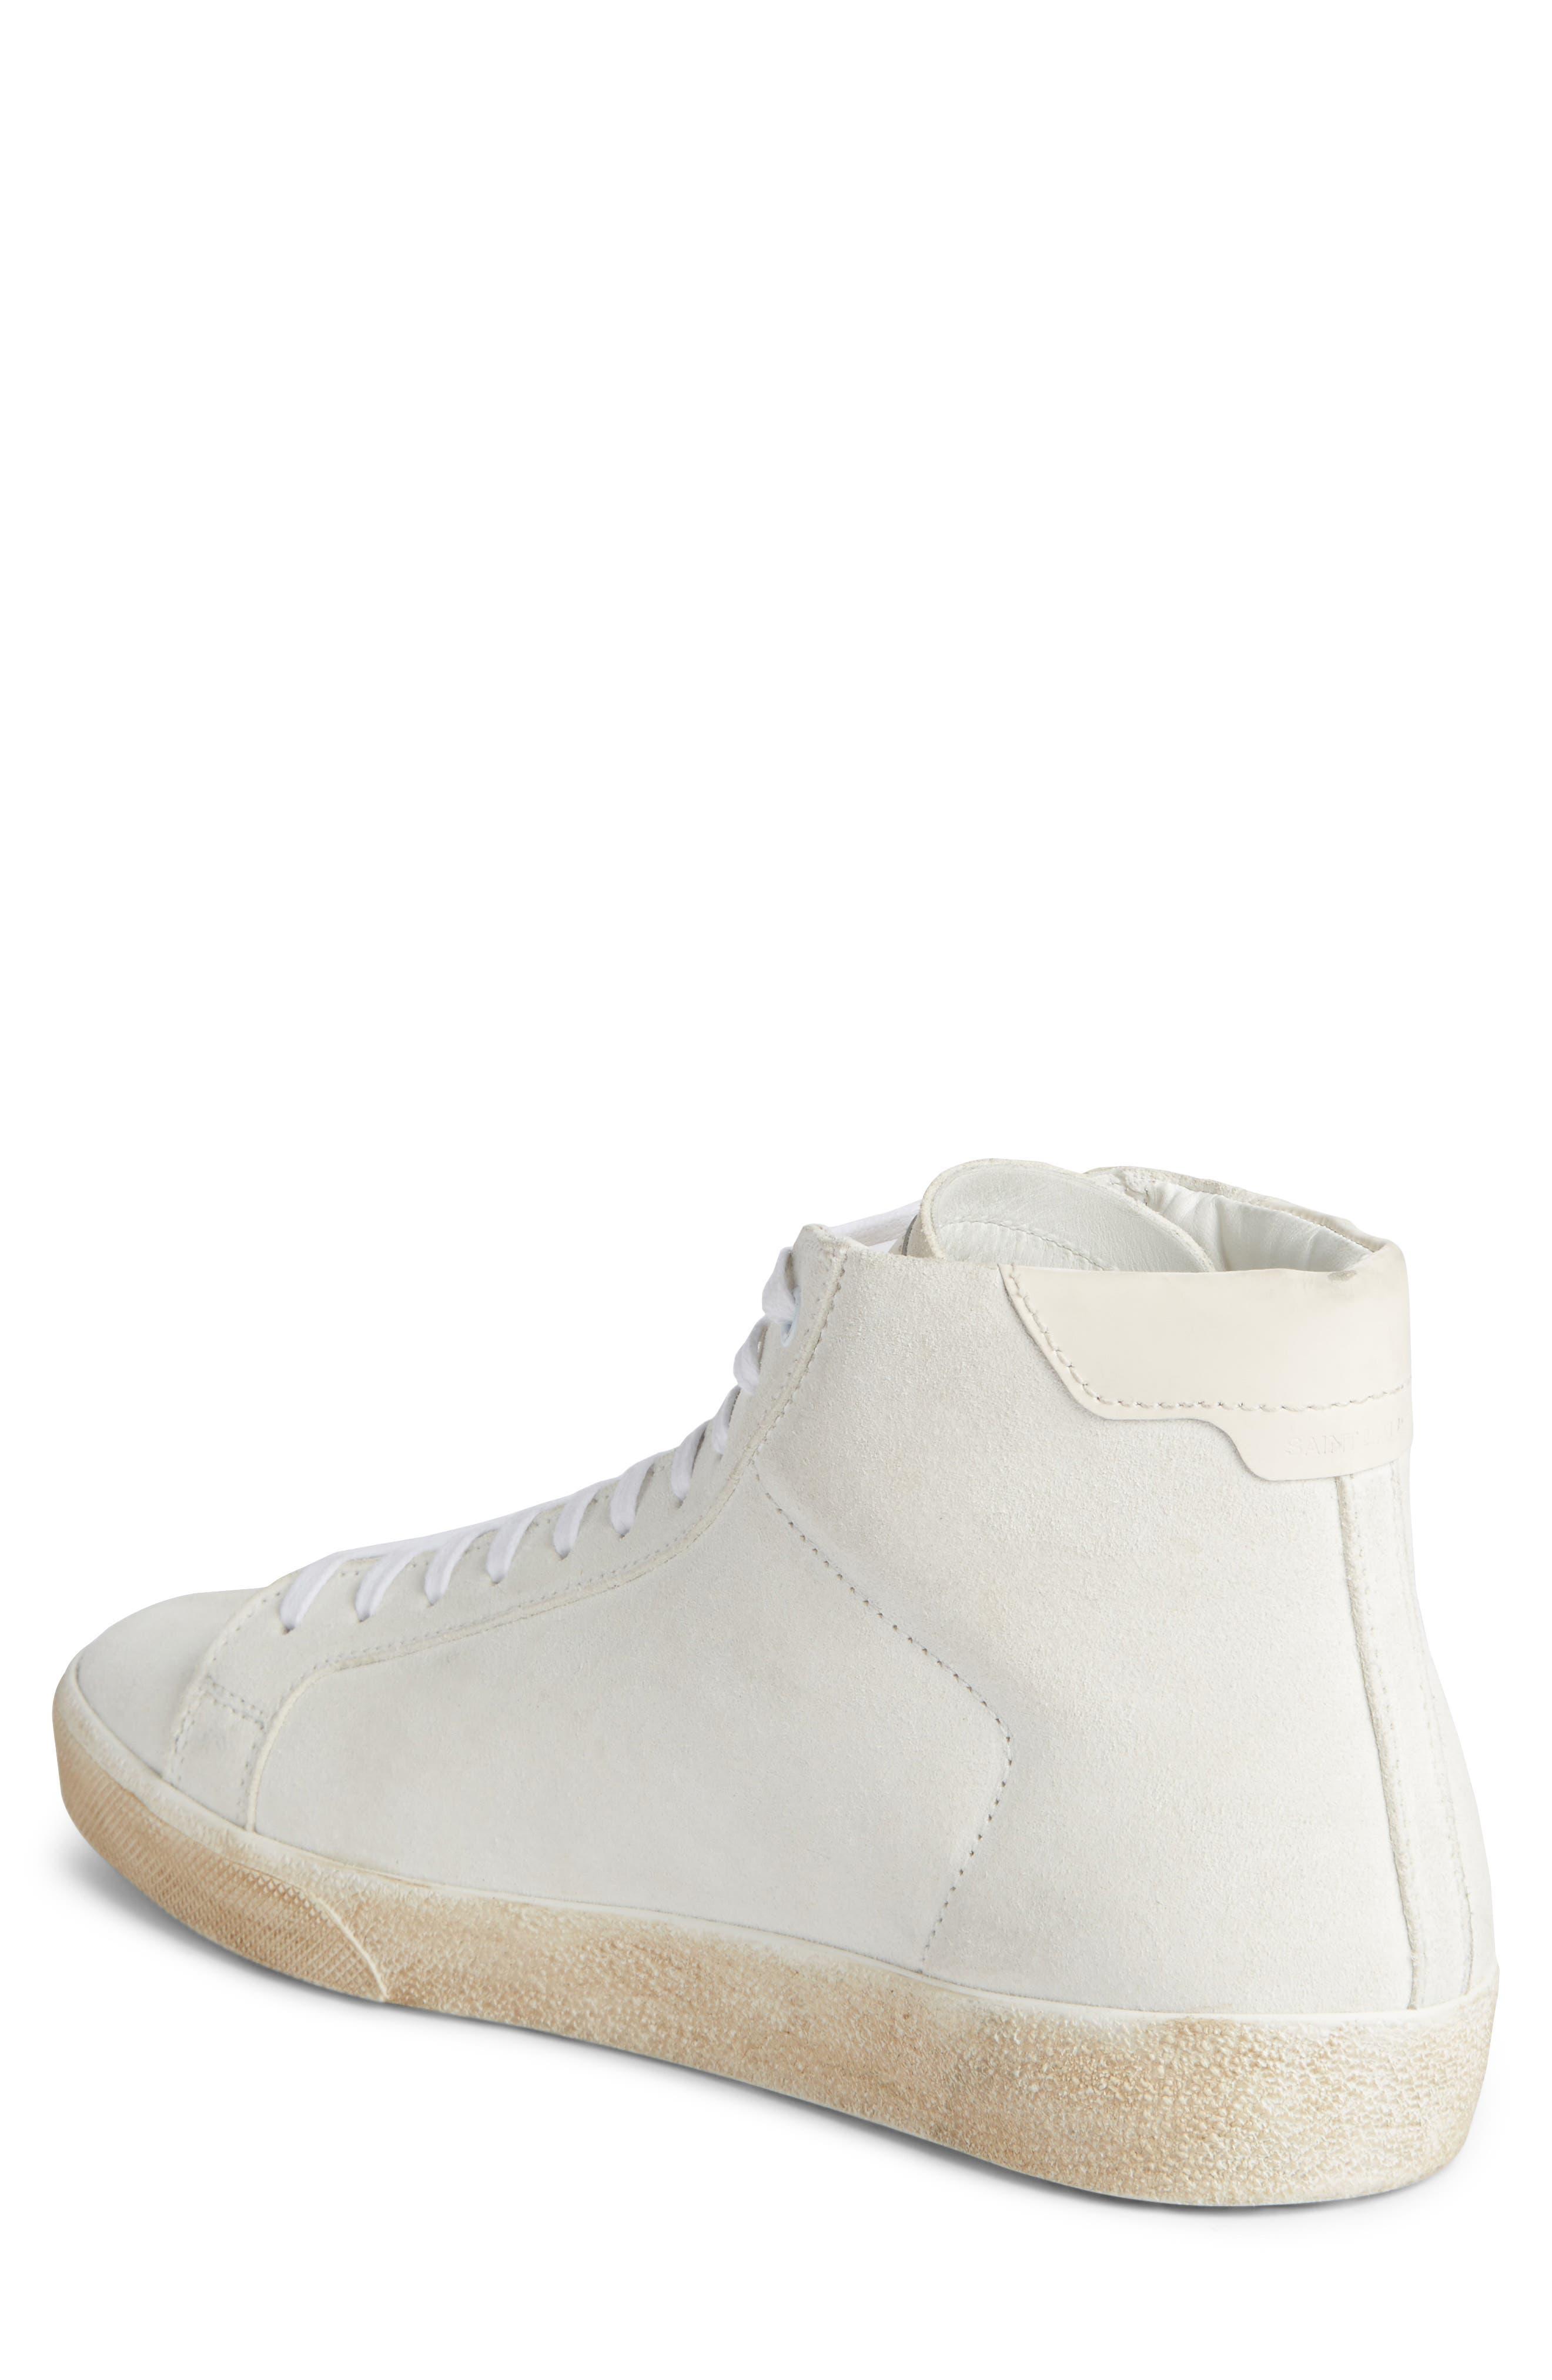 High Top Sneaker,                             Alternate thumbnail 2, color,                             126